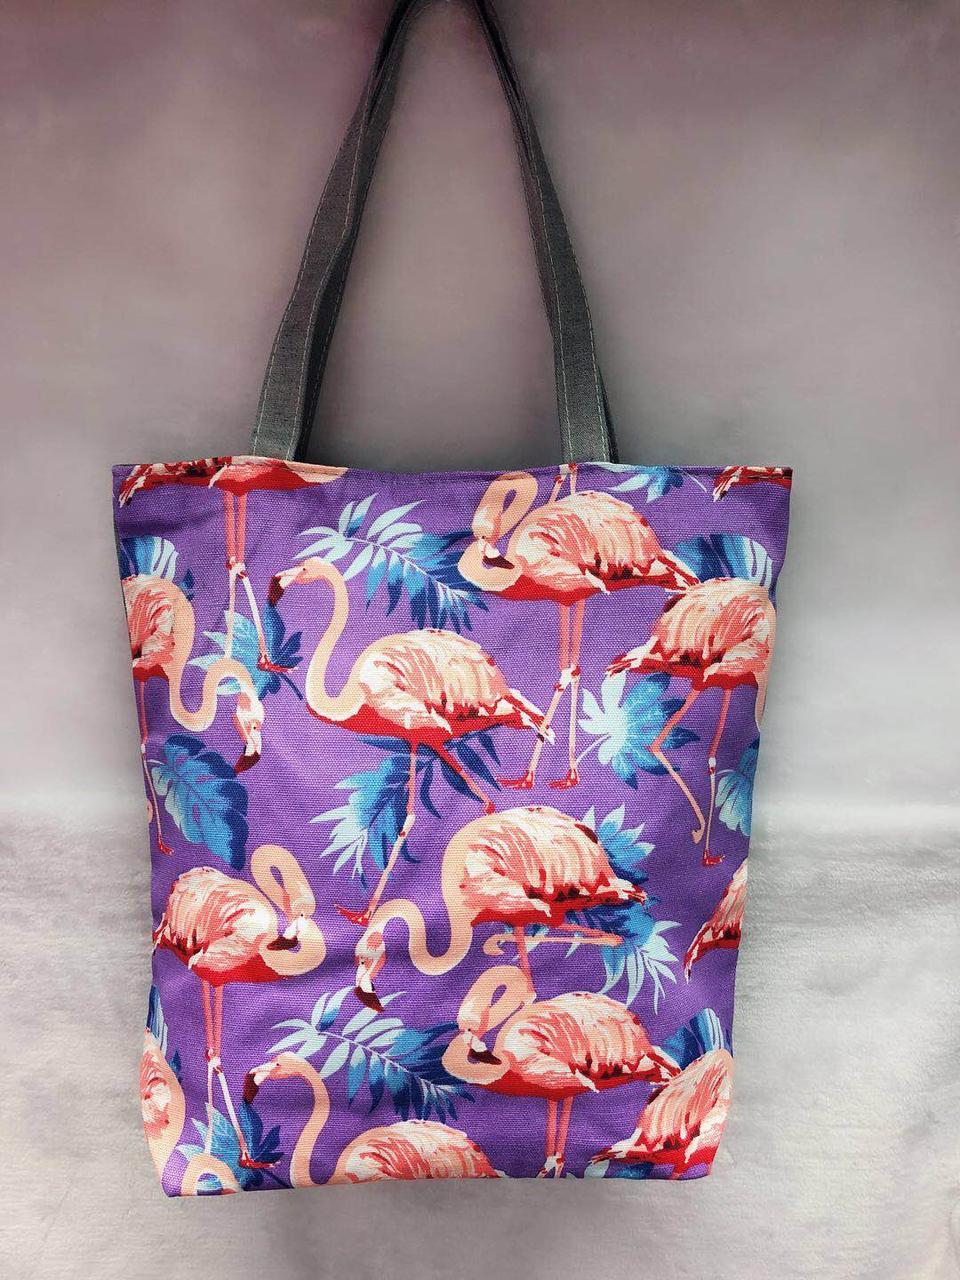 7688f7b4b717 Пляжная сумка Фламинго представлен в магазине «BAGSTYLE»